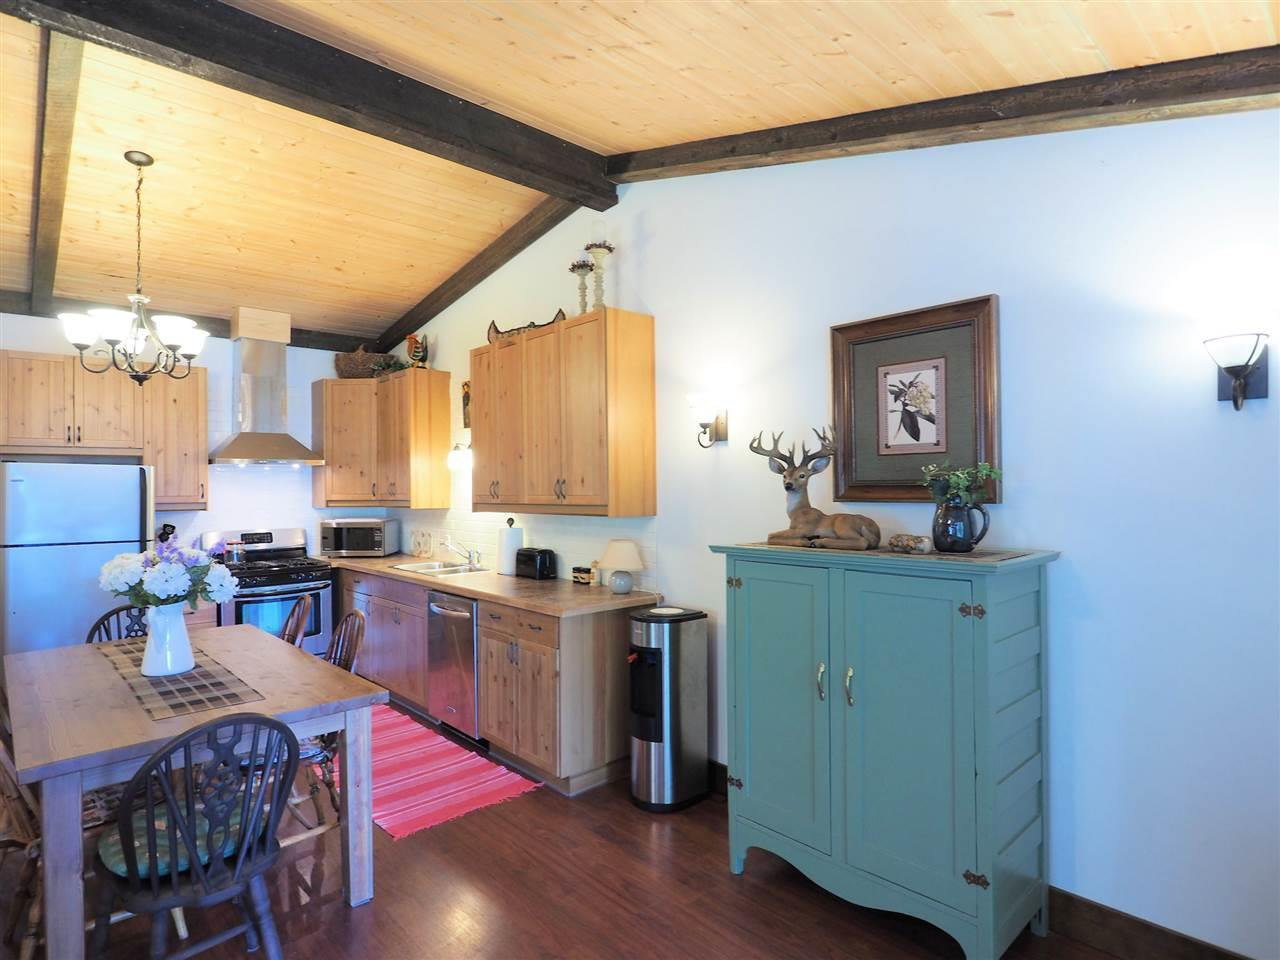 Photo 11: Photos: 8222 CENTENNIAL Road in Bridge Lake: Bridge Lake/Sheridan Lake House for sale (100 Mile House (Zone 10))  : MLS®# R2457362